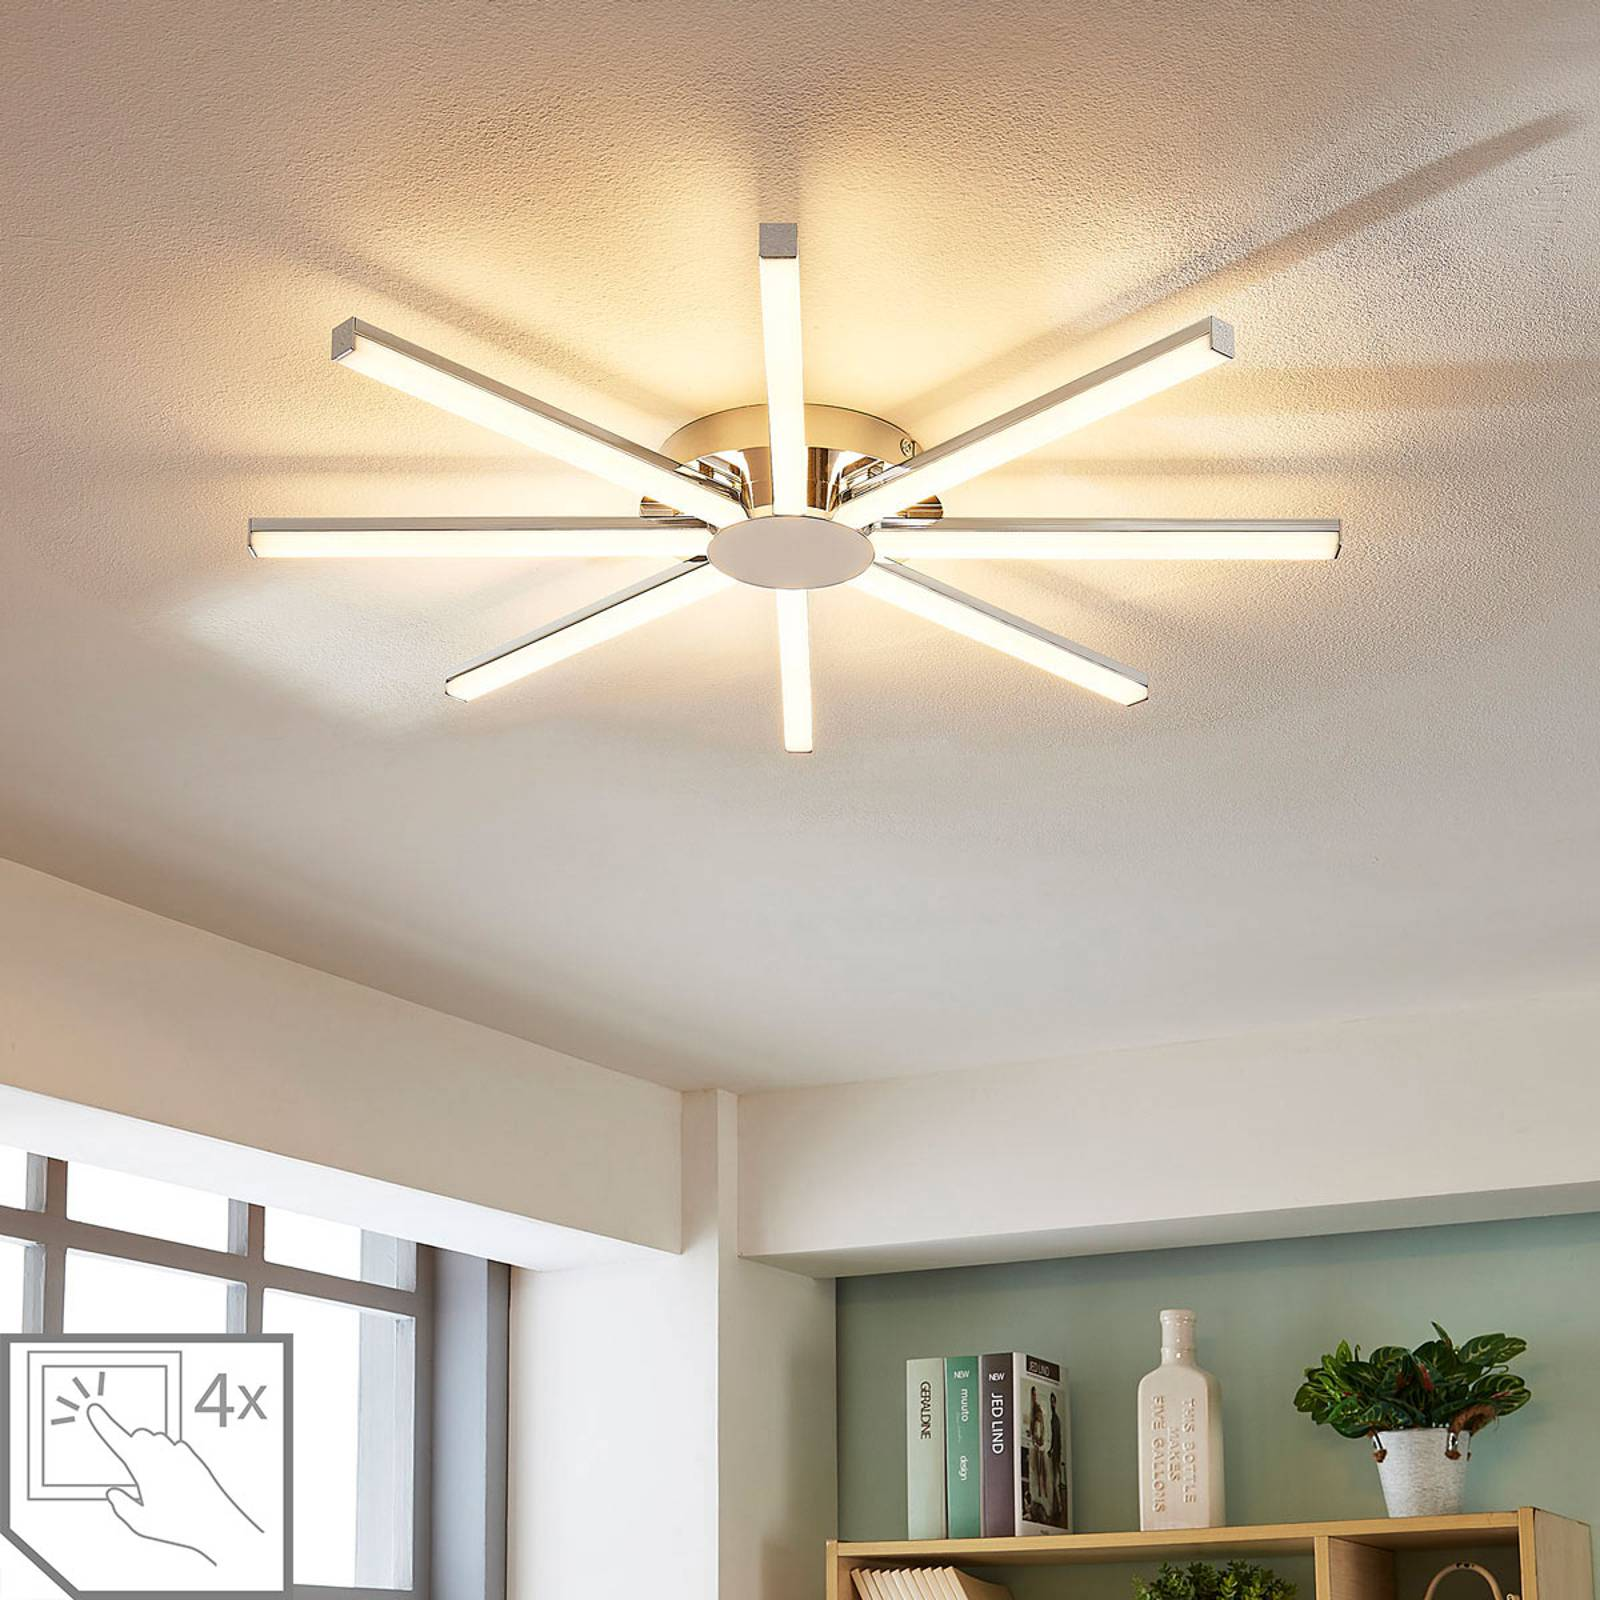 Zonnevormige LED plafondlamp Korona, dimbaar